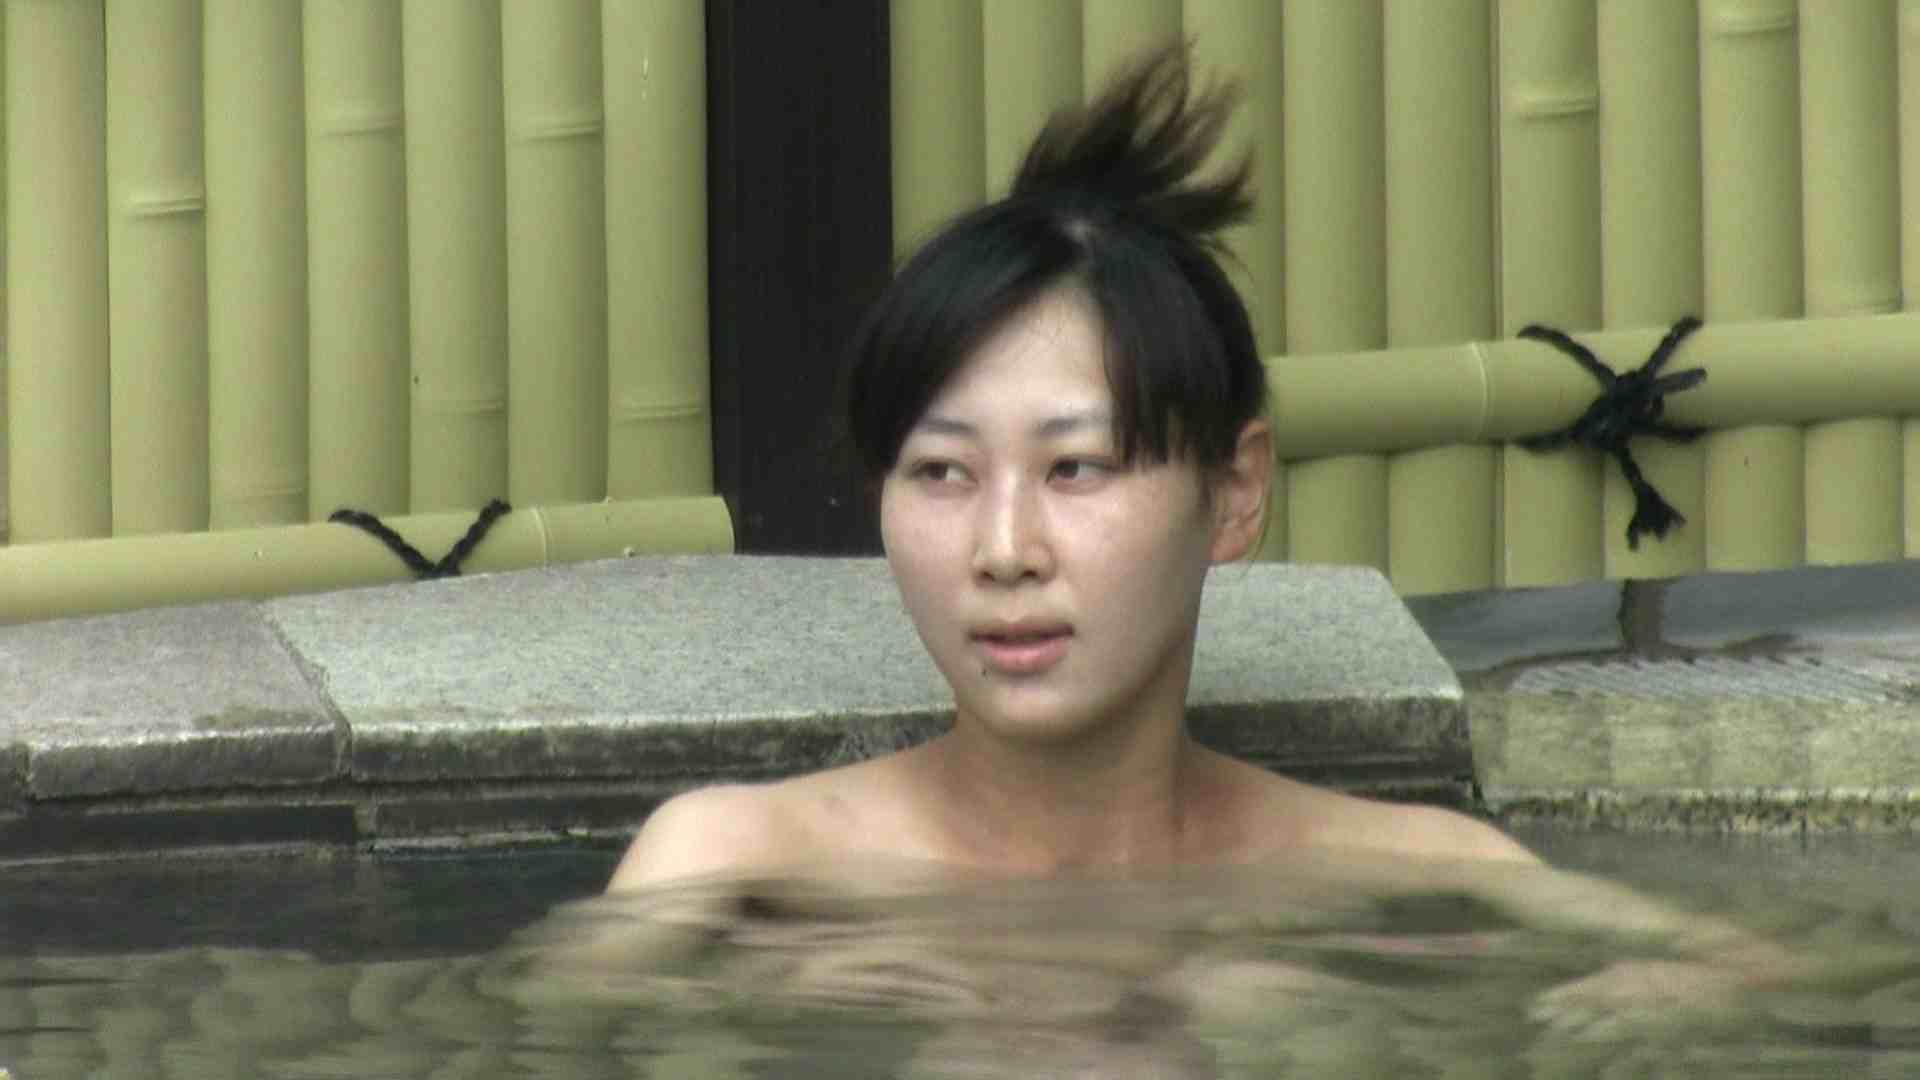 Aquaな露天風呂Vol.665 HなOL   盗撮  104pic 55